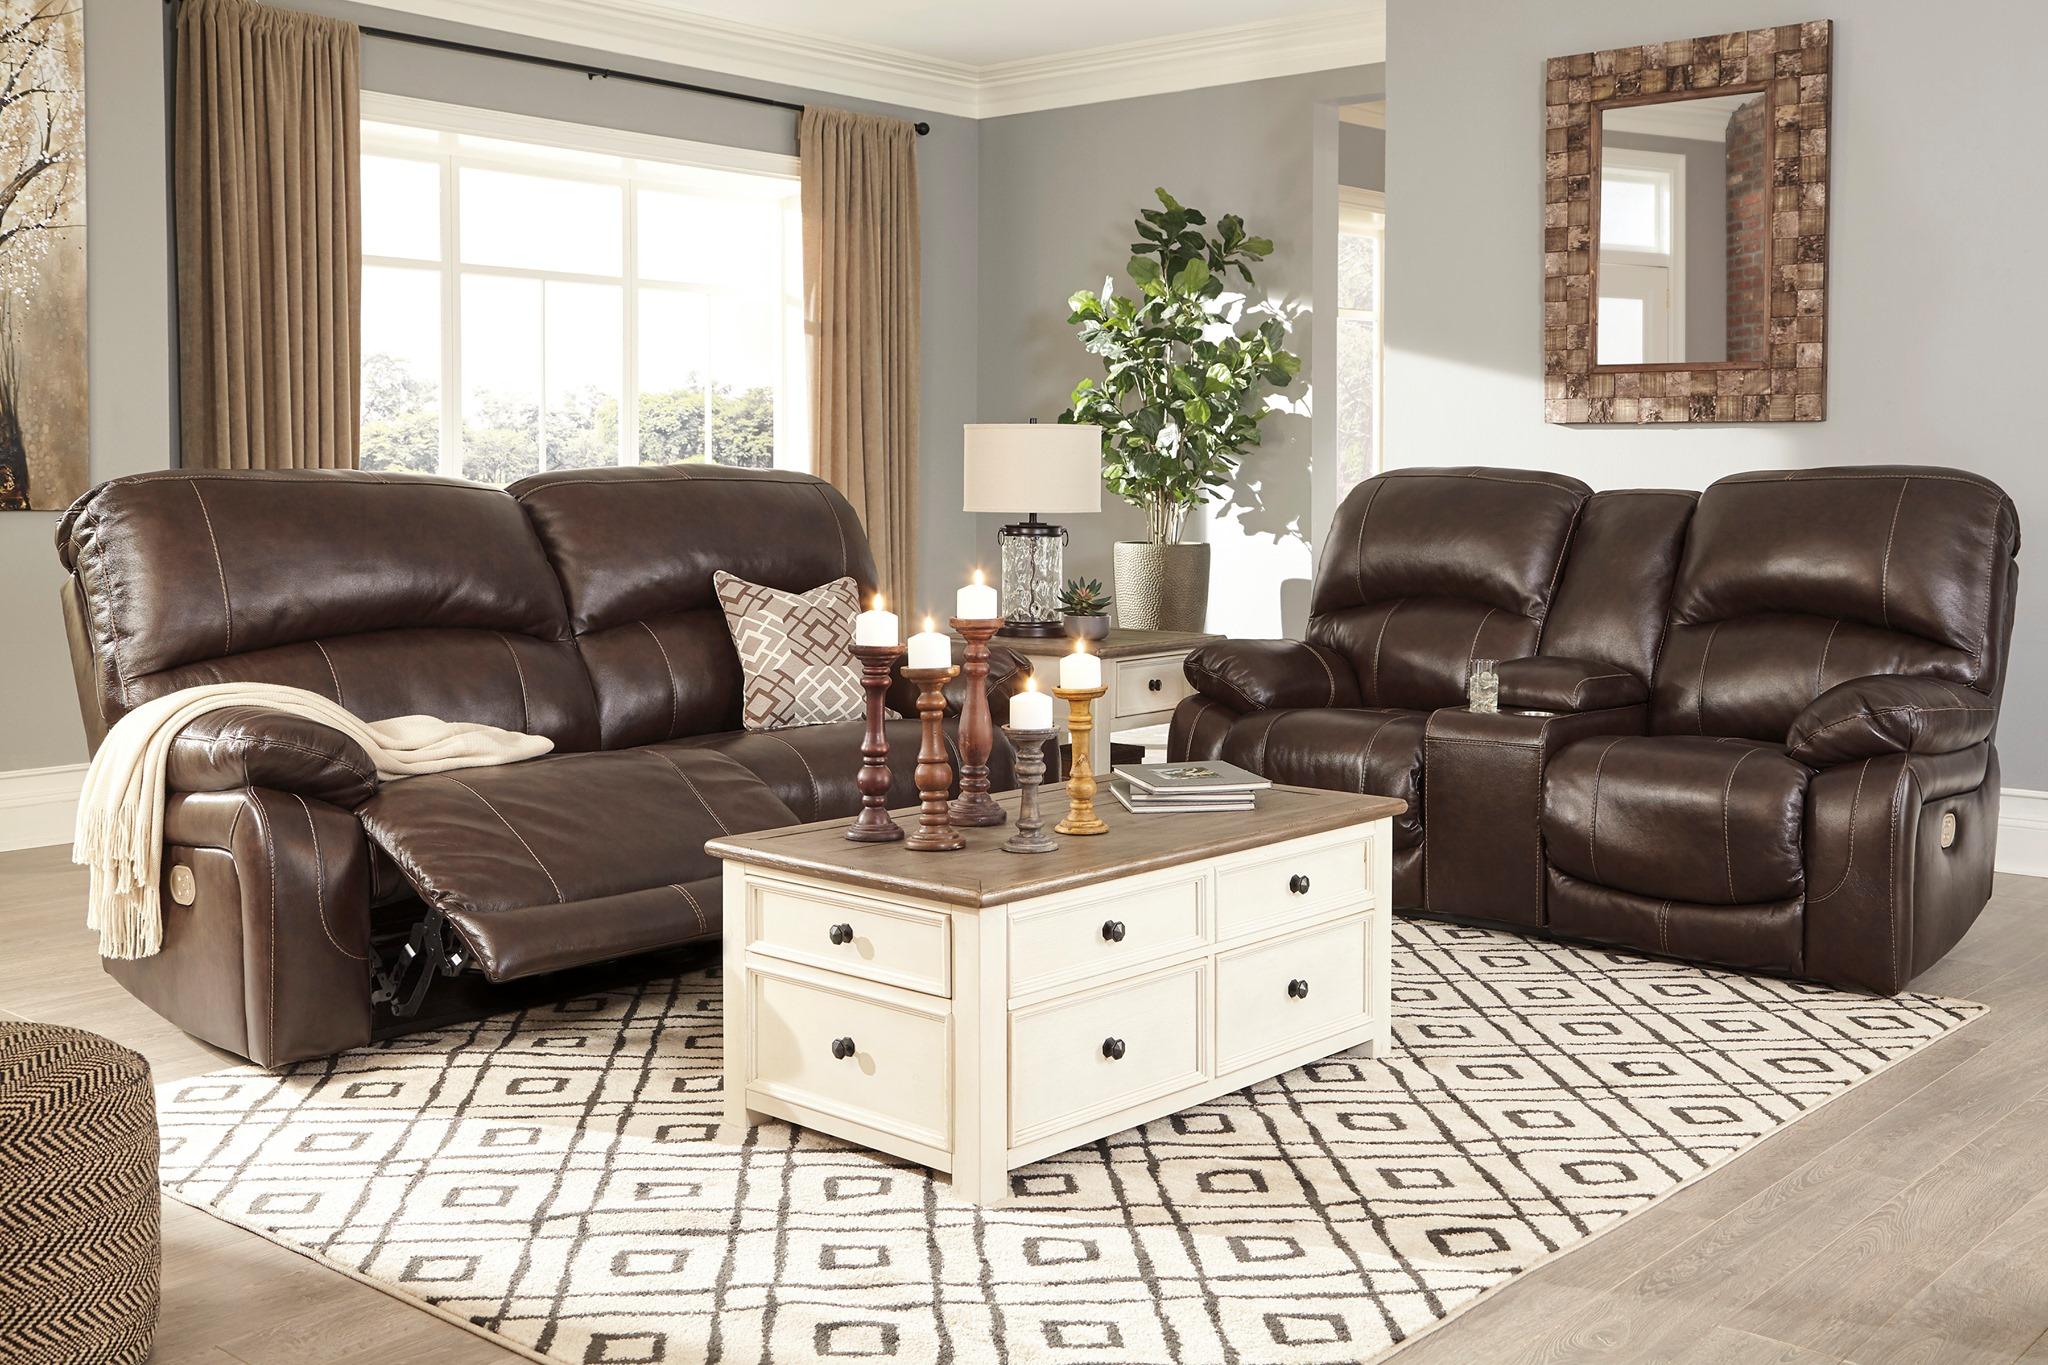 Ashley Furniture HomeStore 6499 Whittlesey Blvd, Columbus